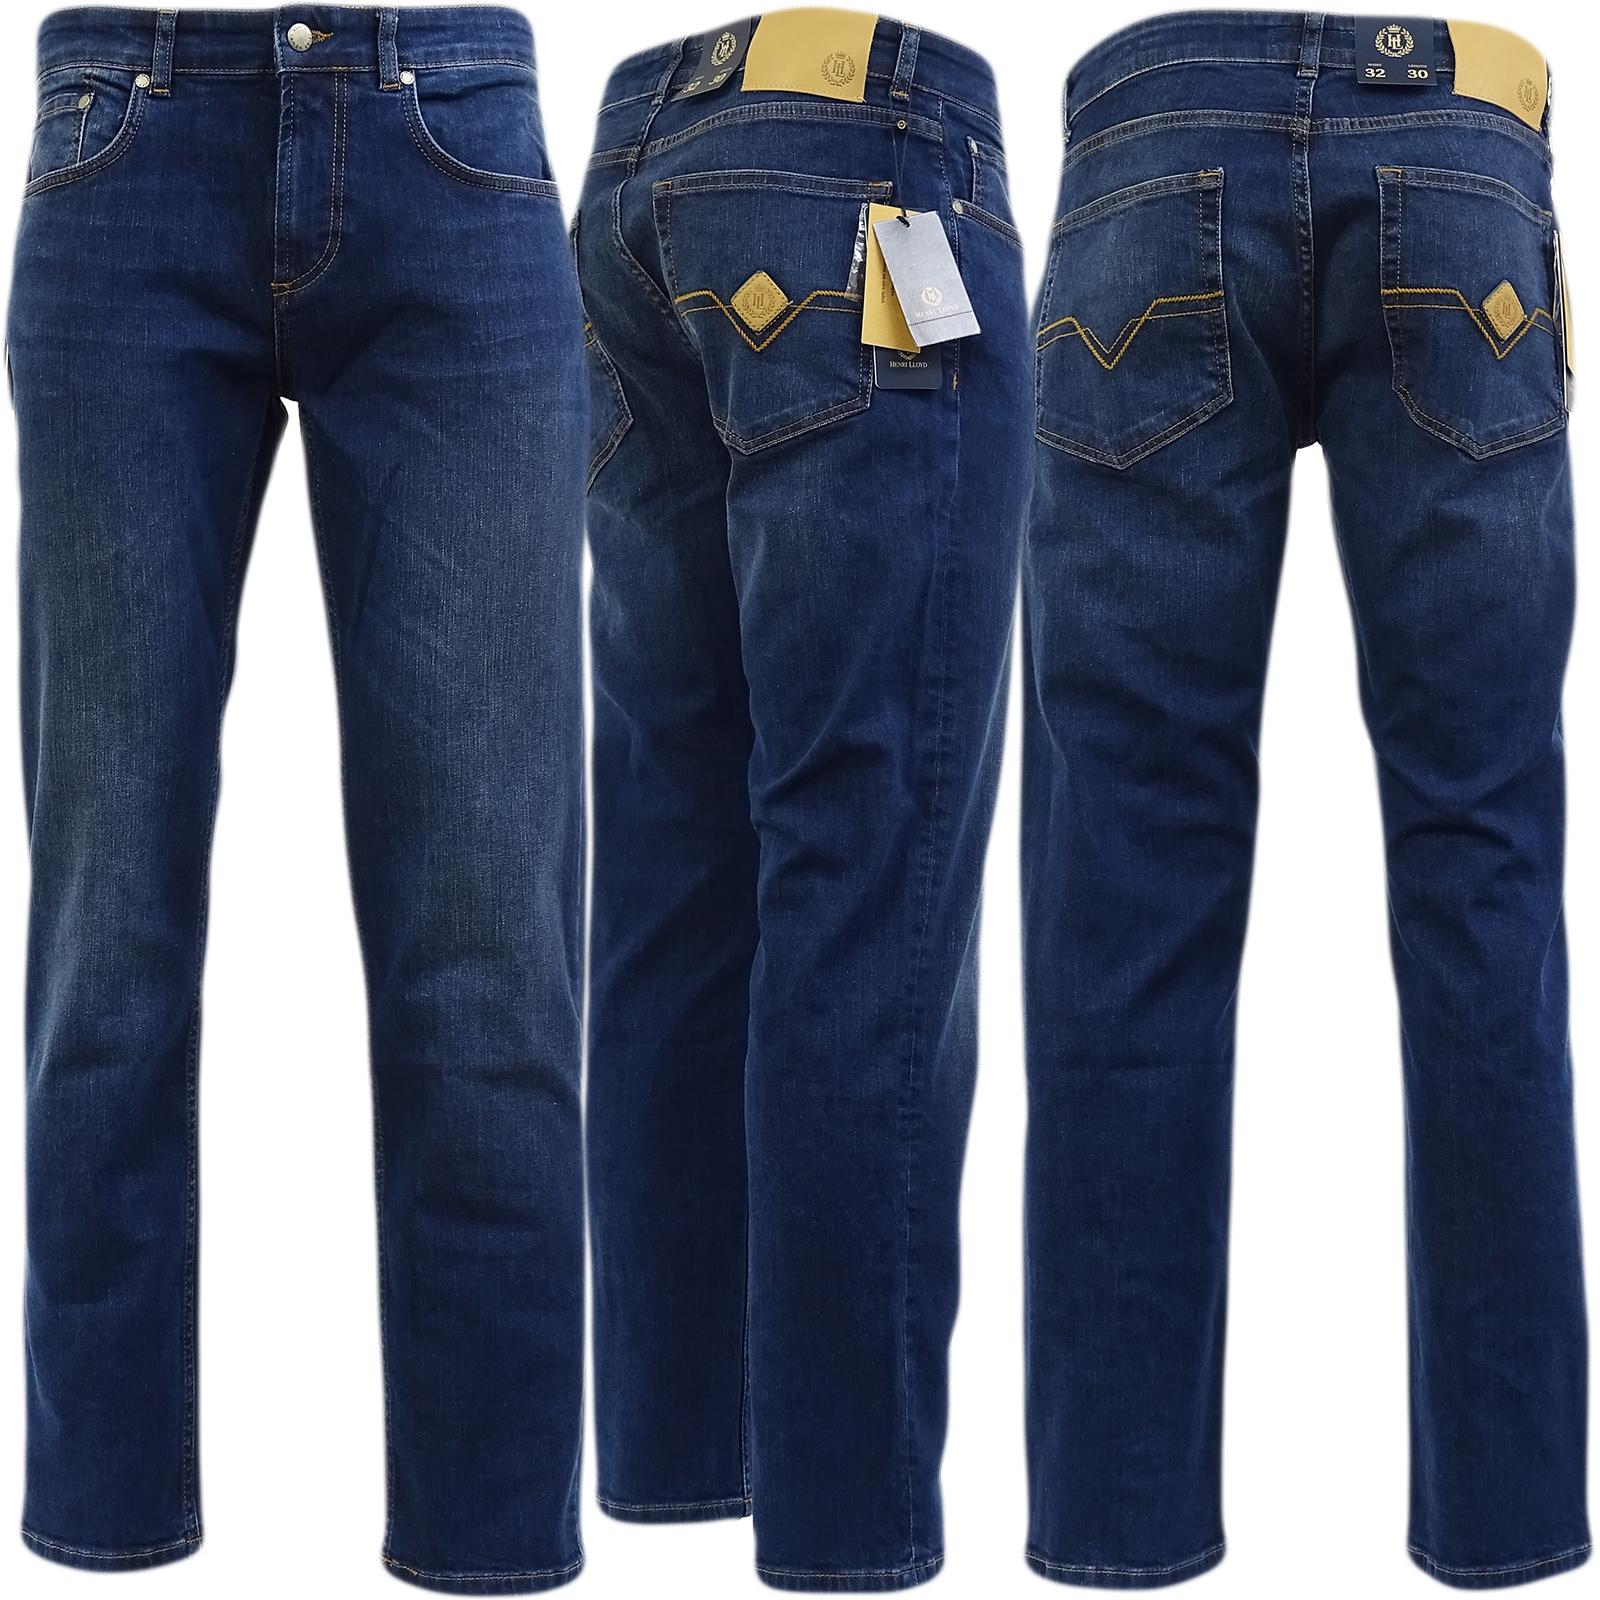 Henri Lloyd Stonewash Regular Fit - Zip Fly Denim Straight Leg Jean Manston - Vdw -